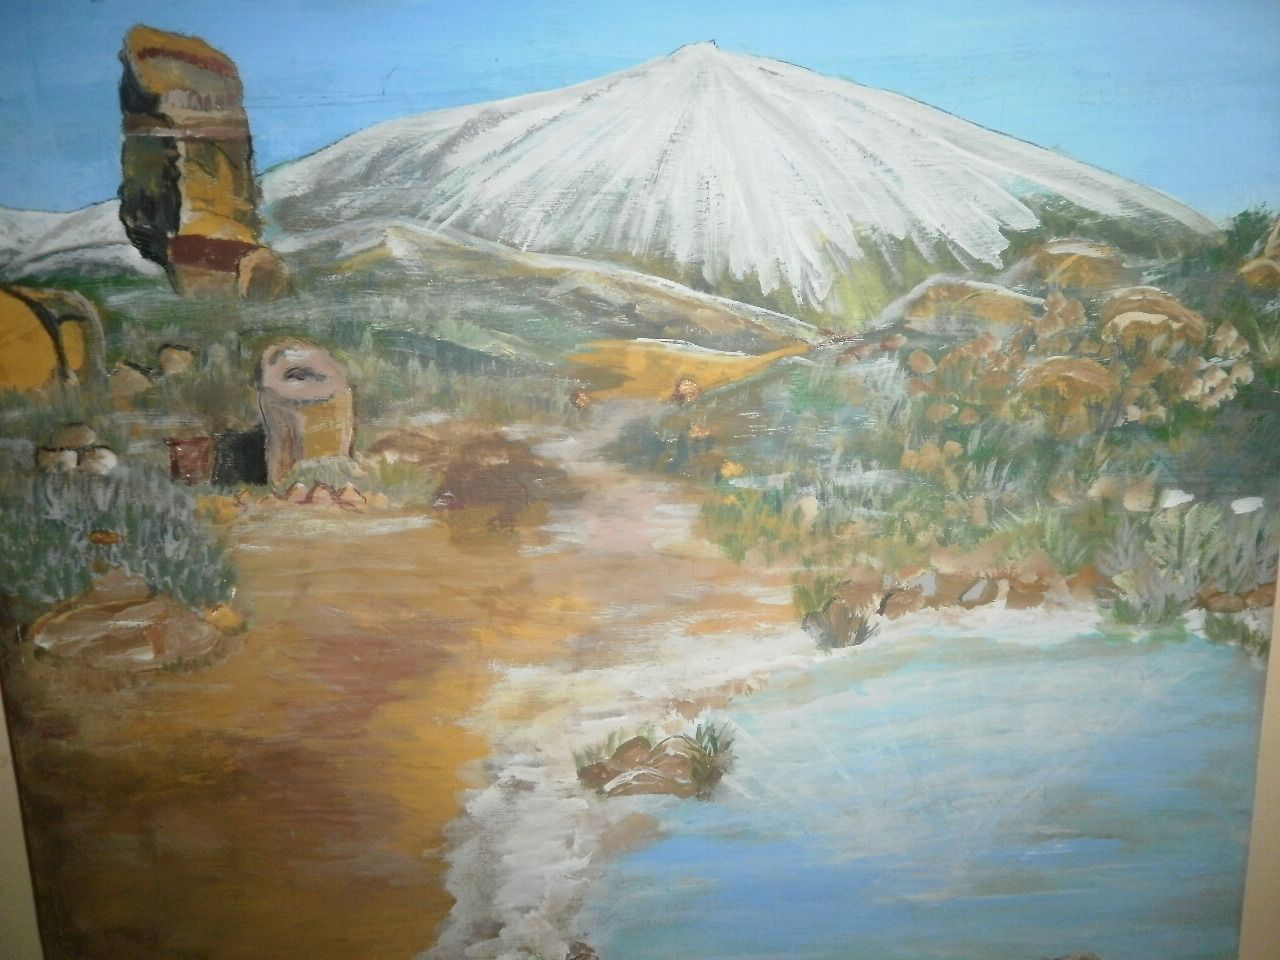 Mirian González Fagúndez  TEIDE NEVADO  Acrílico en lienzo  59X60 cm  LA GOMERA  2012